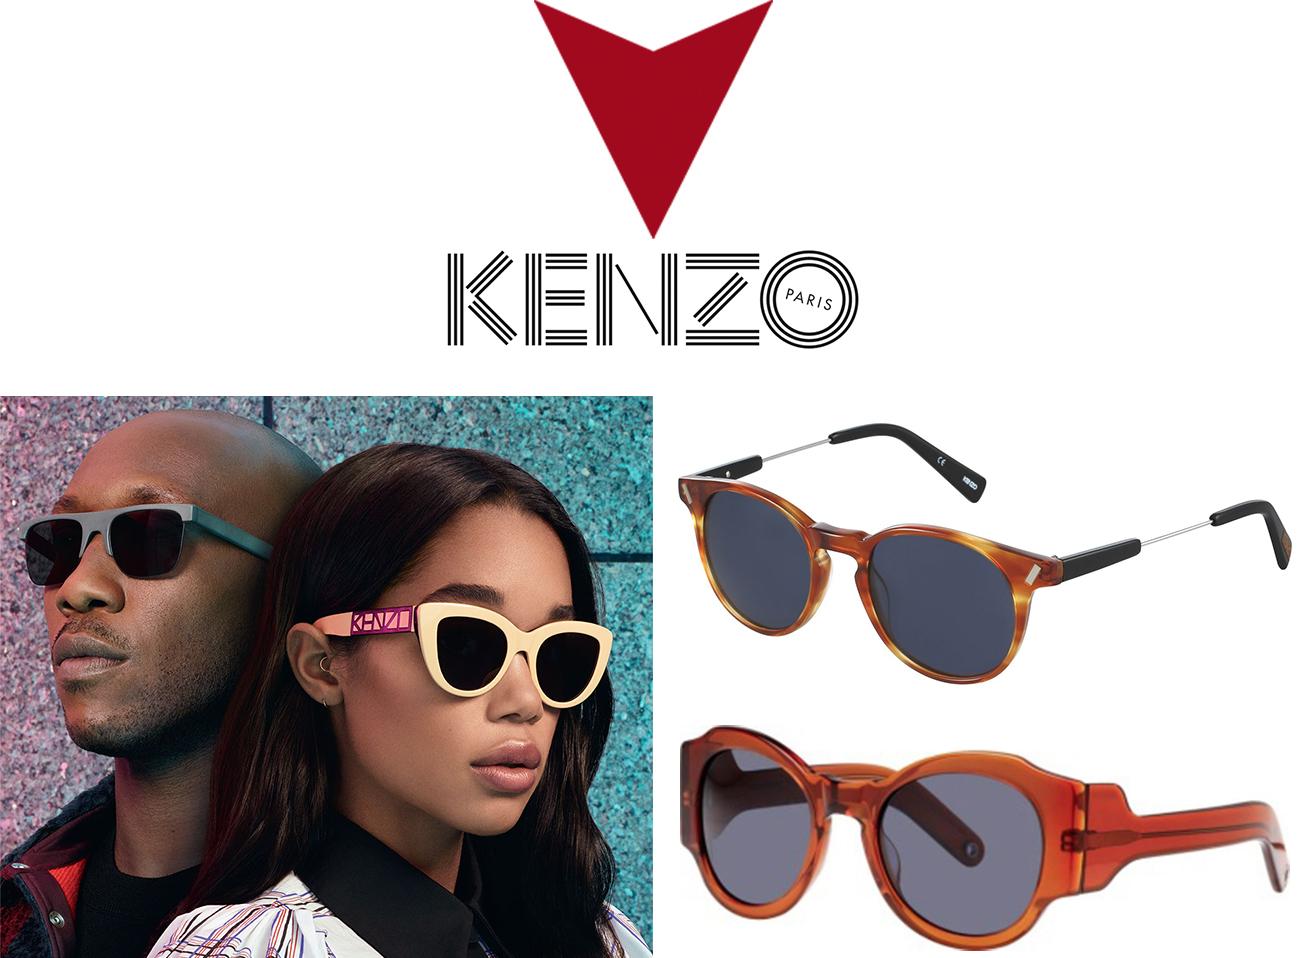 KENZO sunglasses